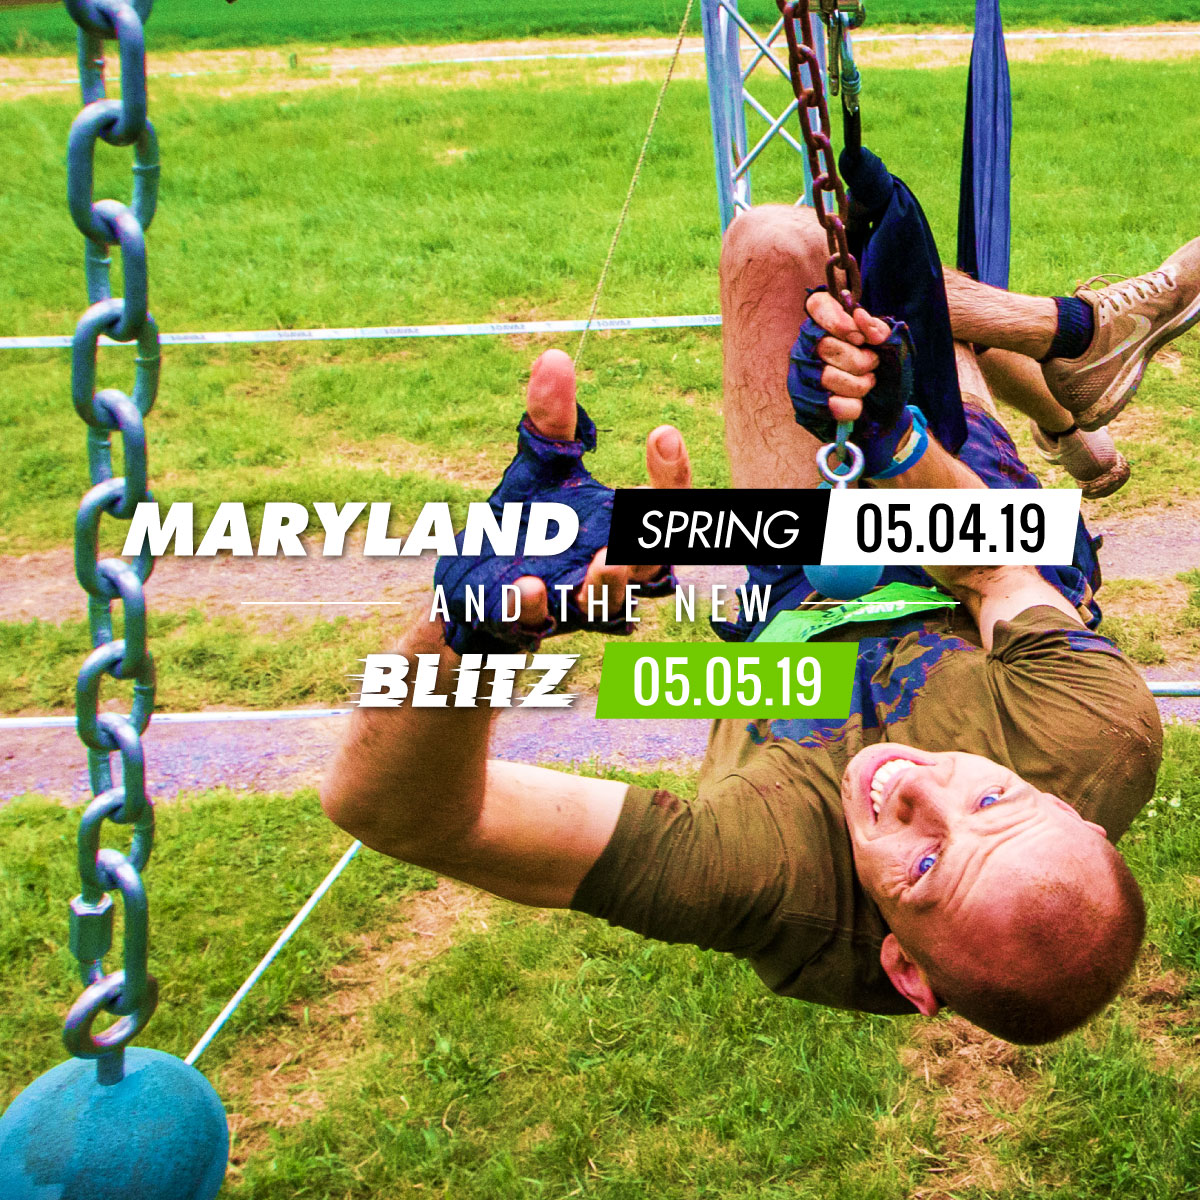 Maryland Spring 2019